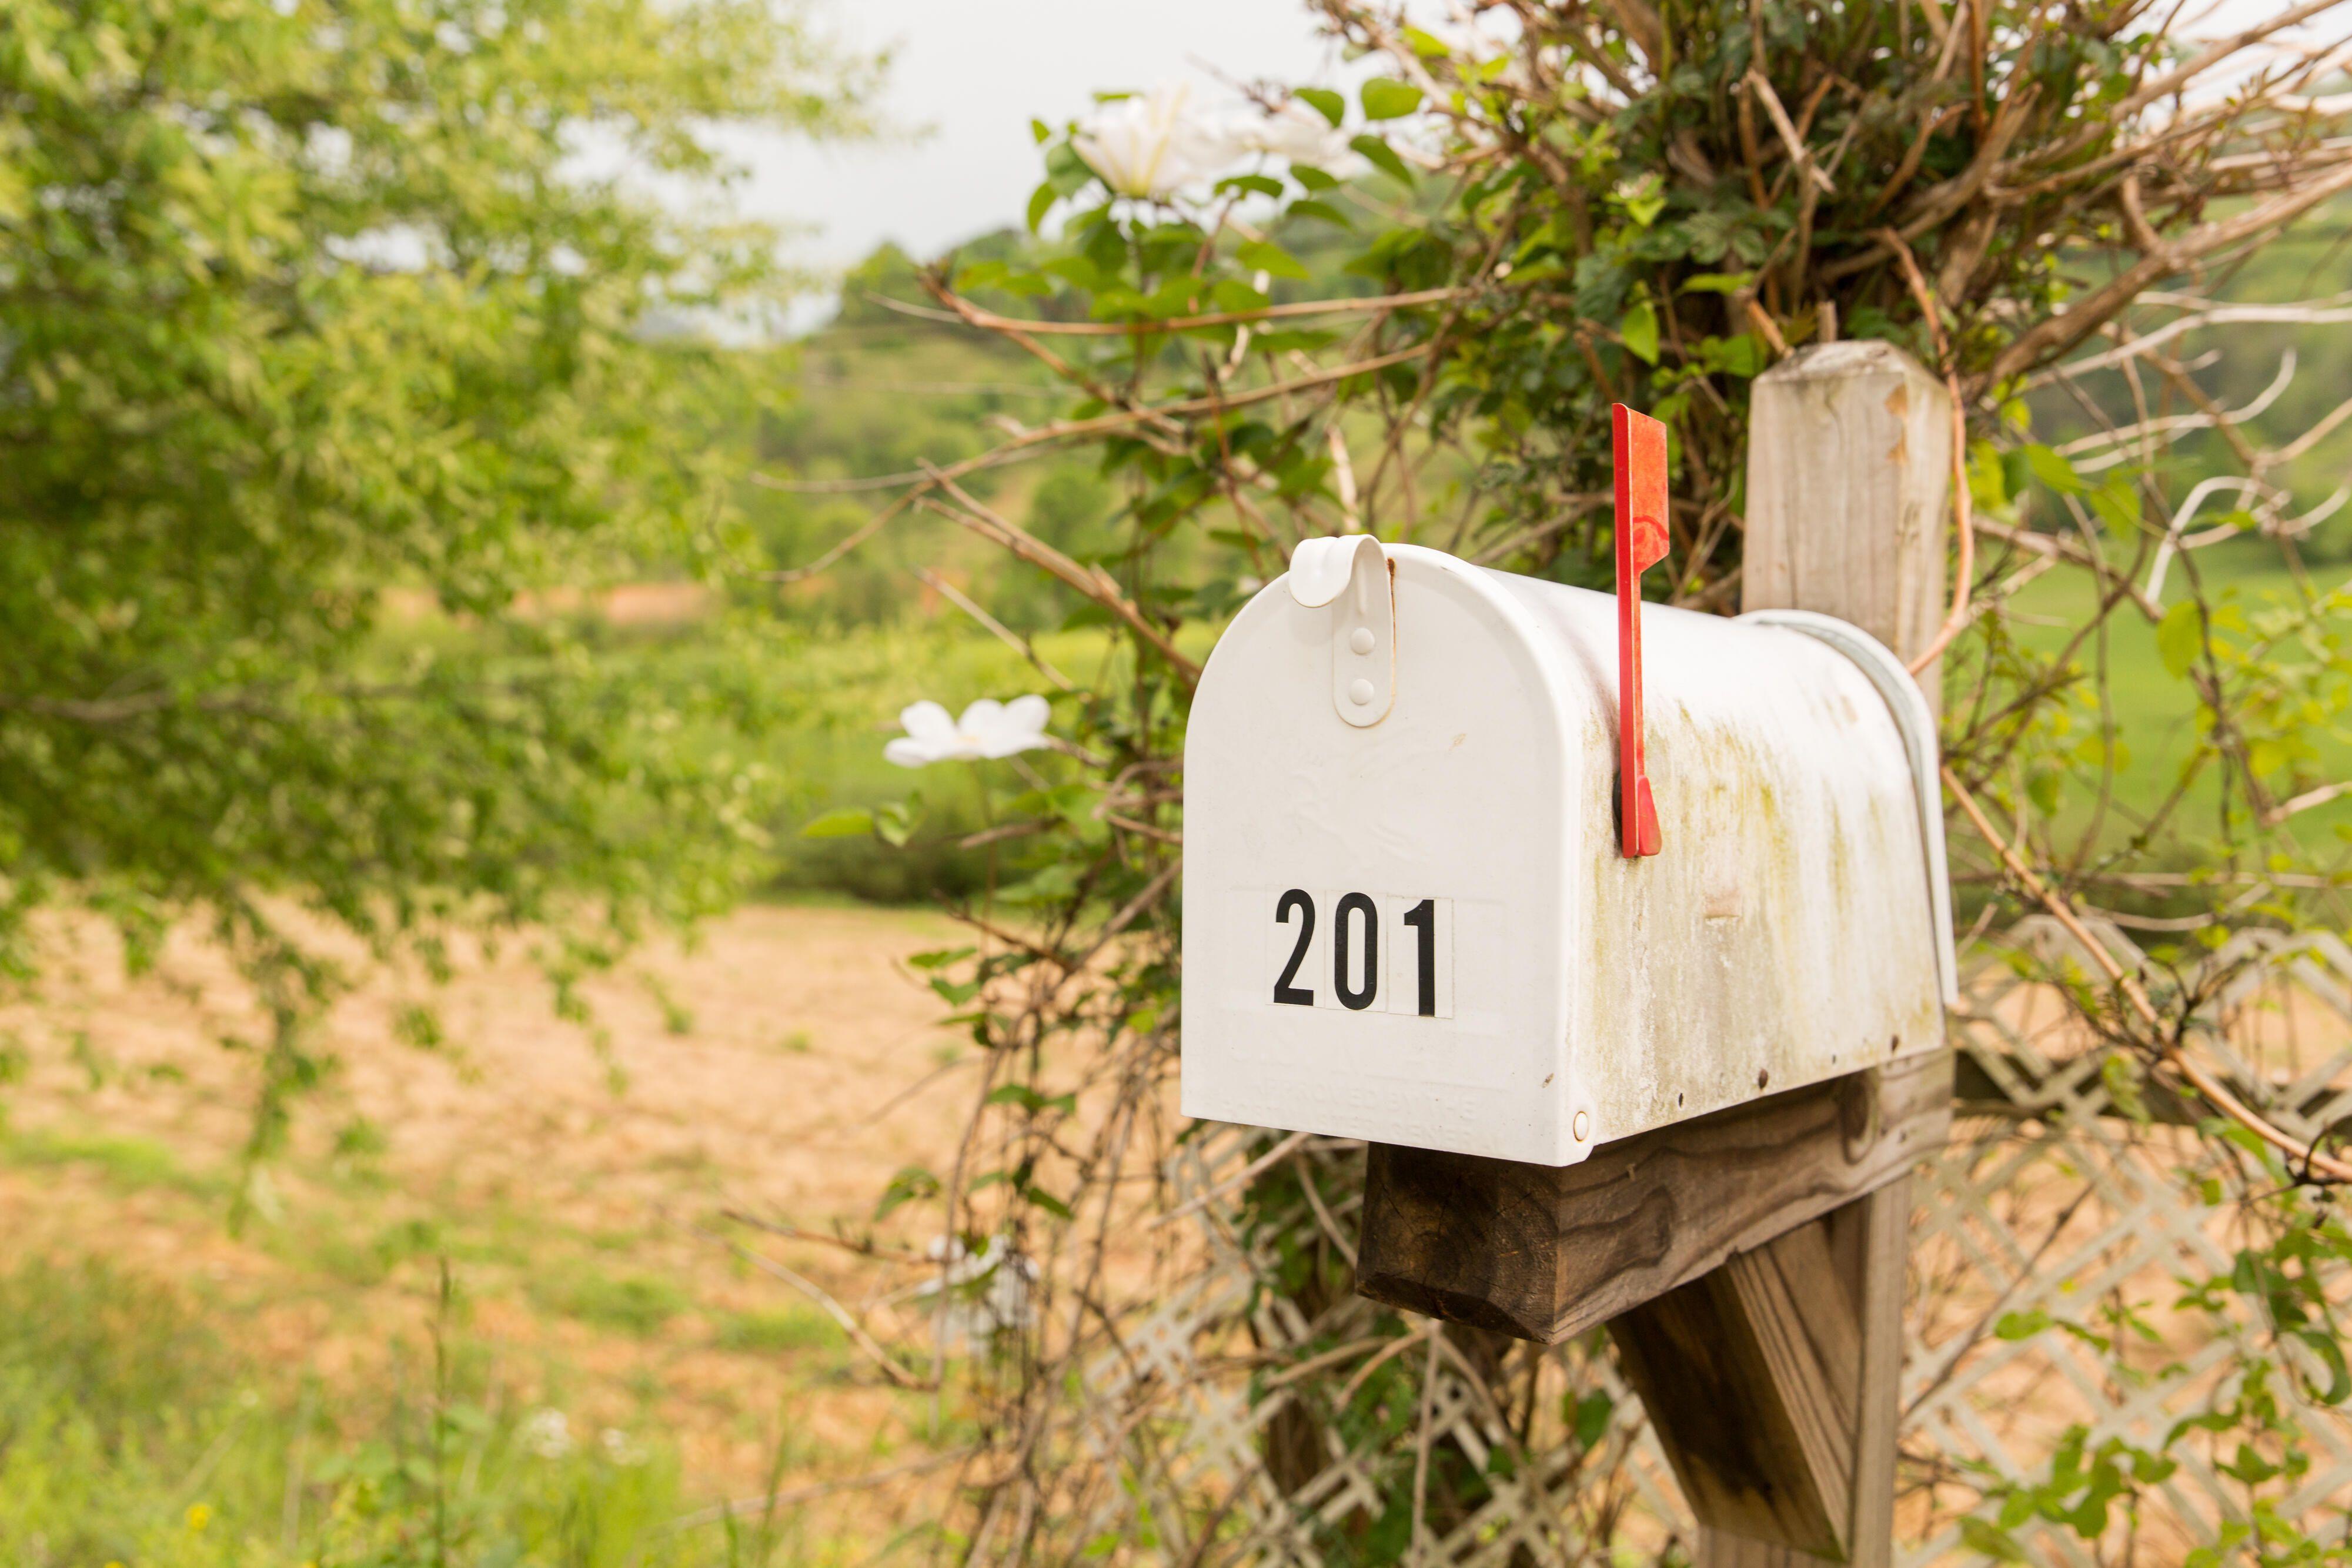 Postal mailbox